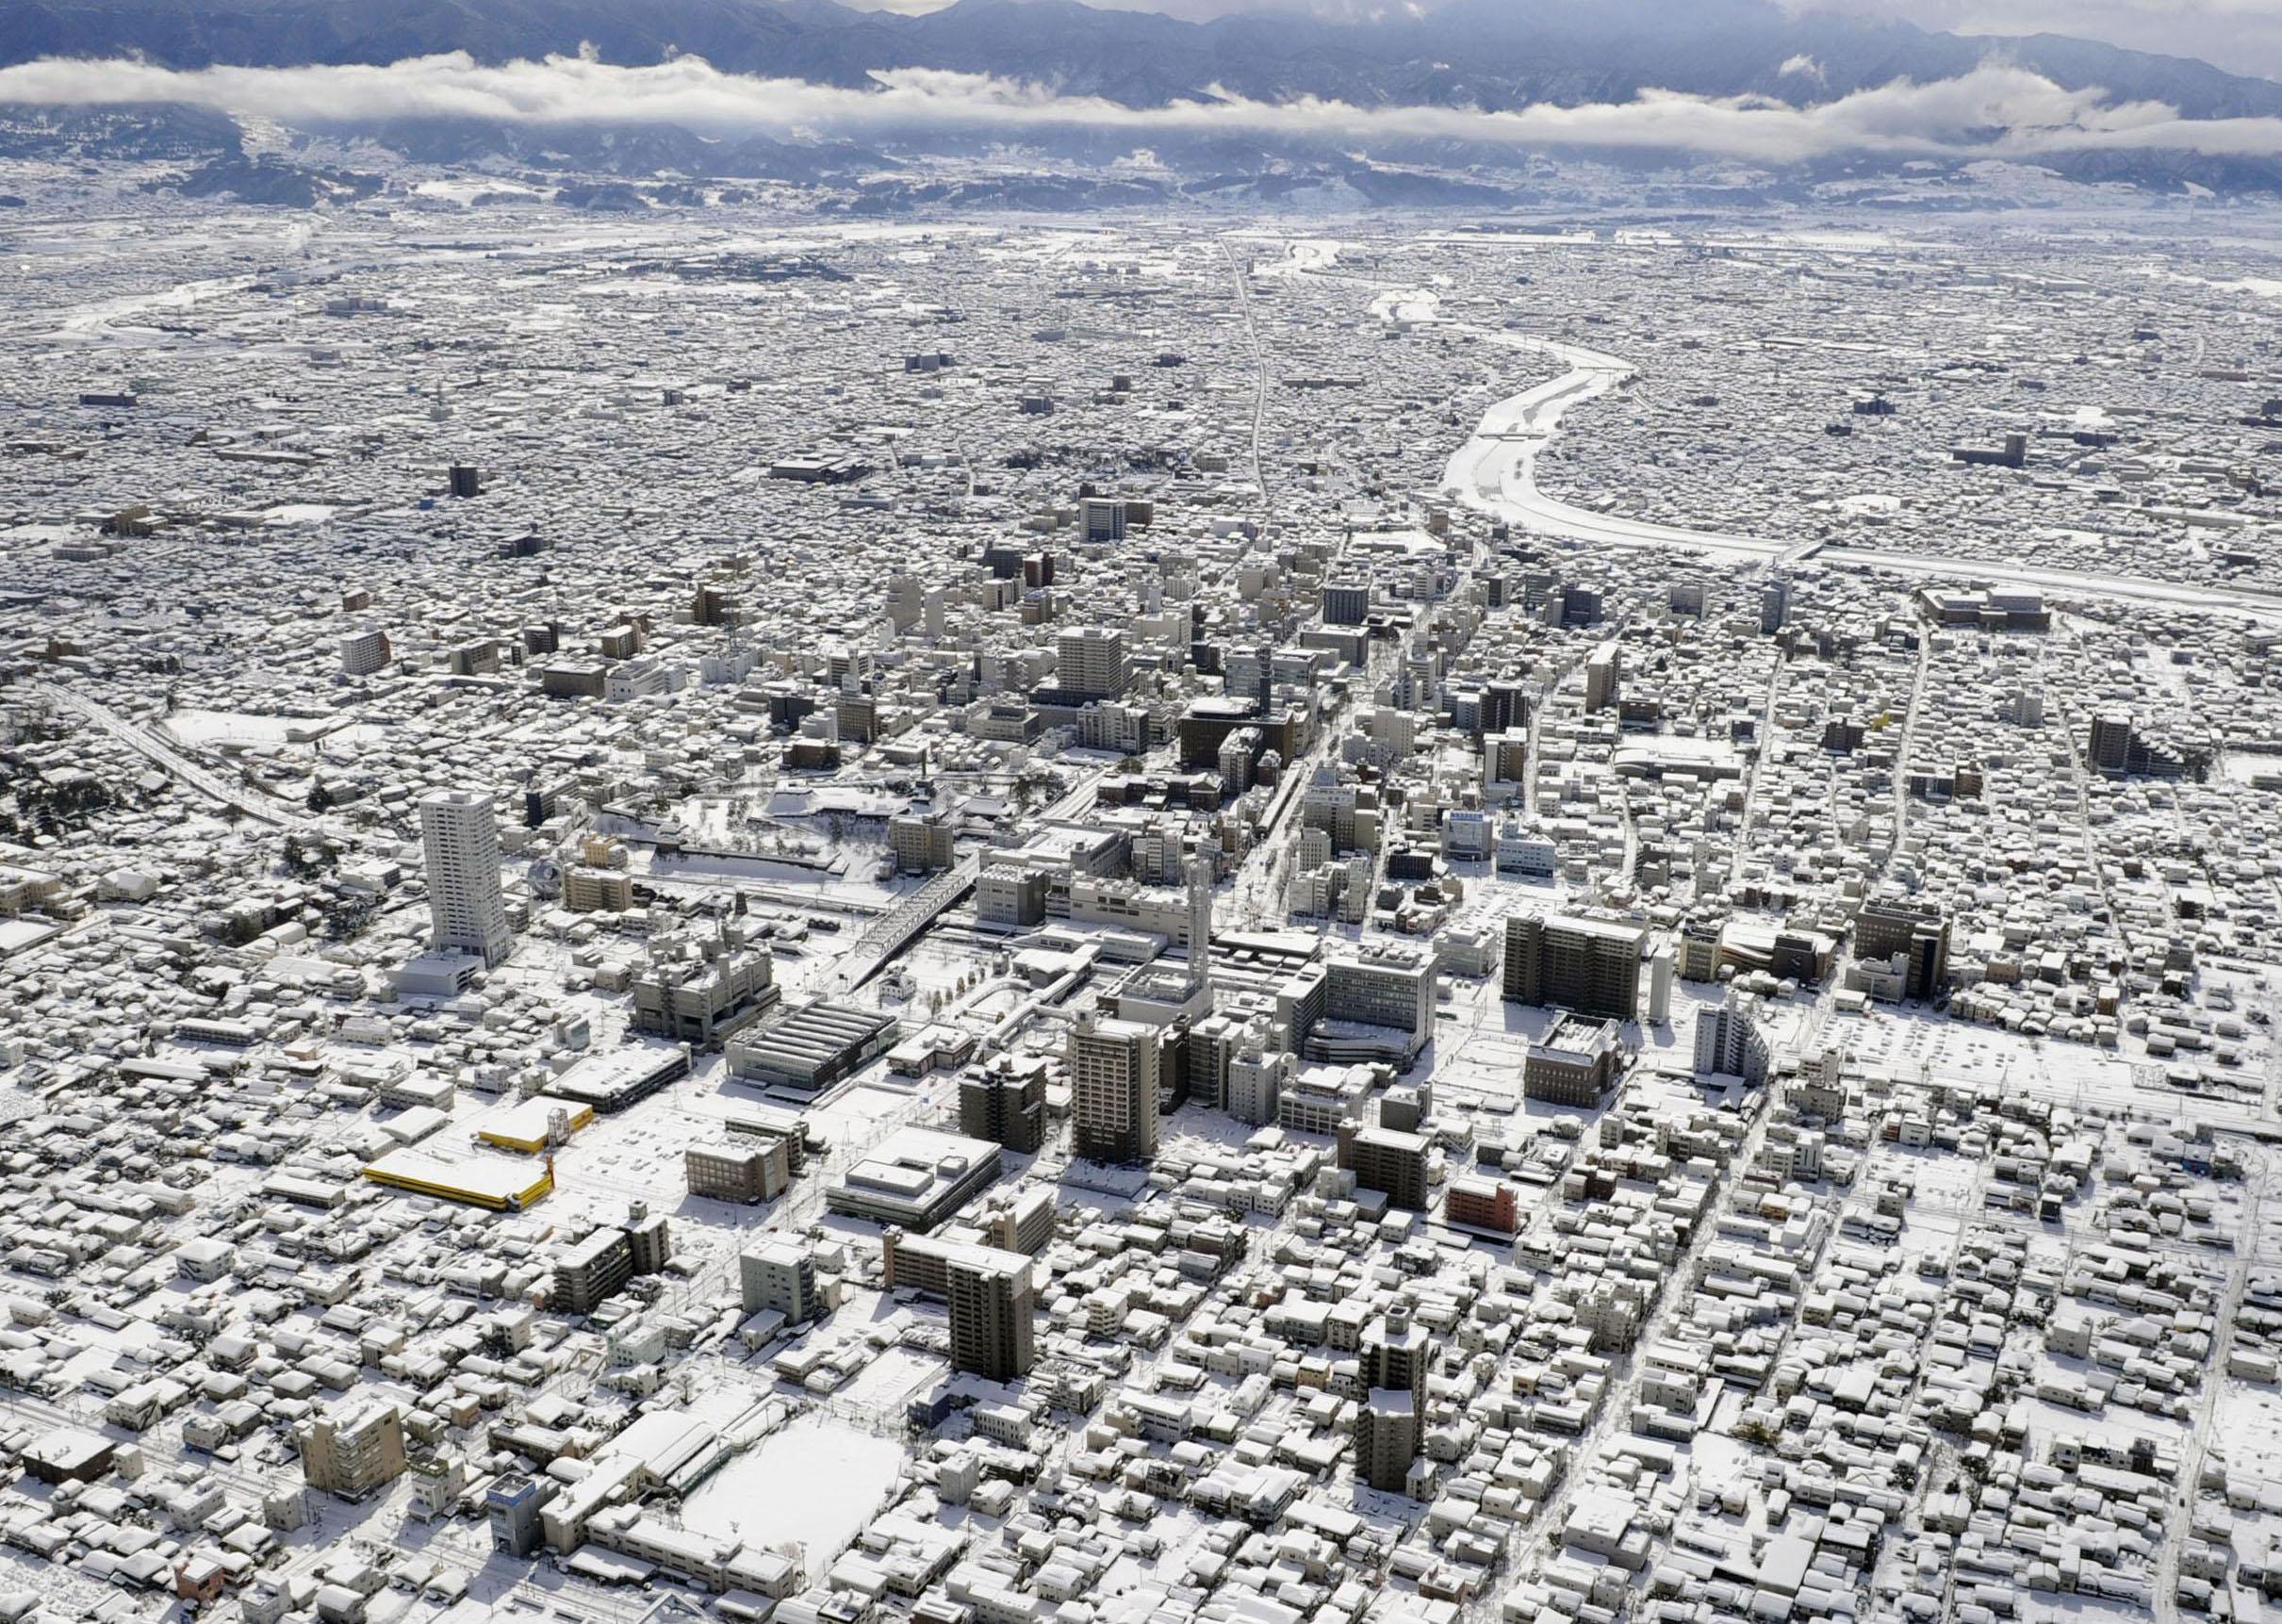 Giappone - Nevicate 2014 Imc